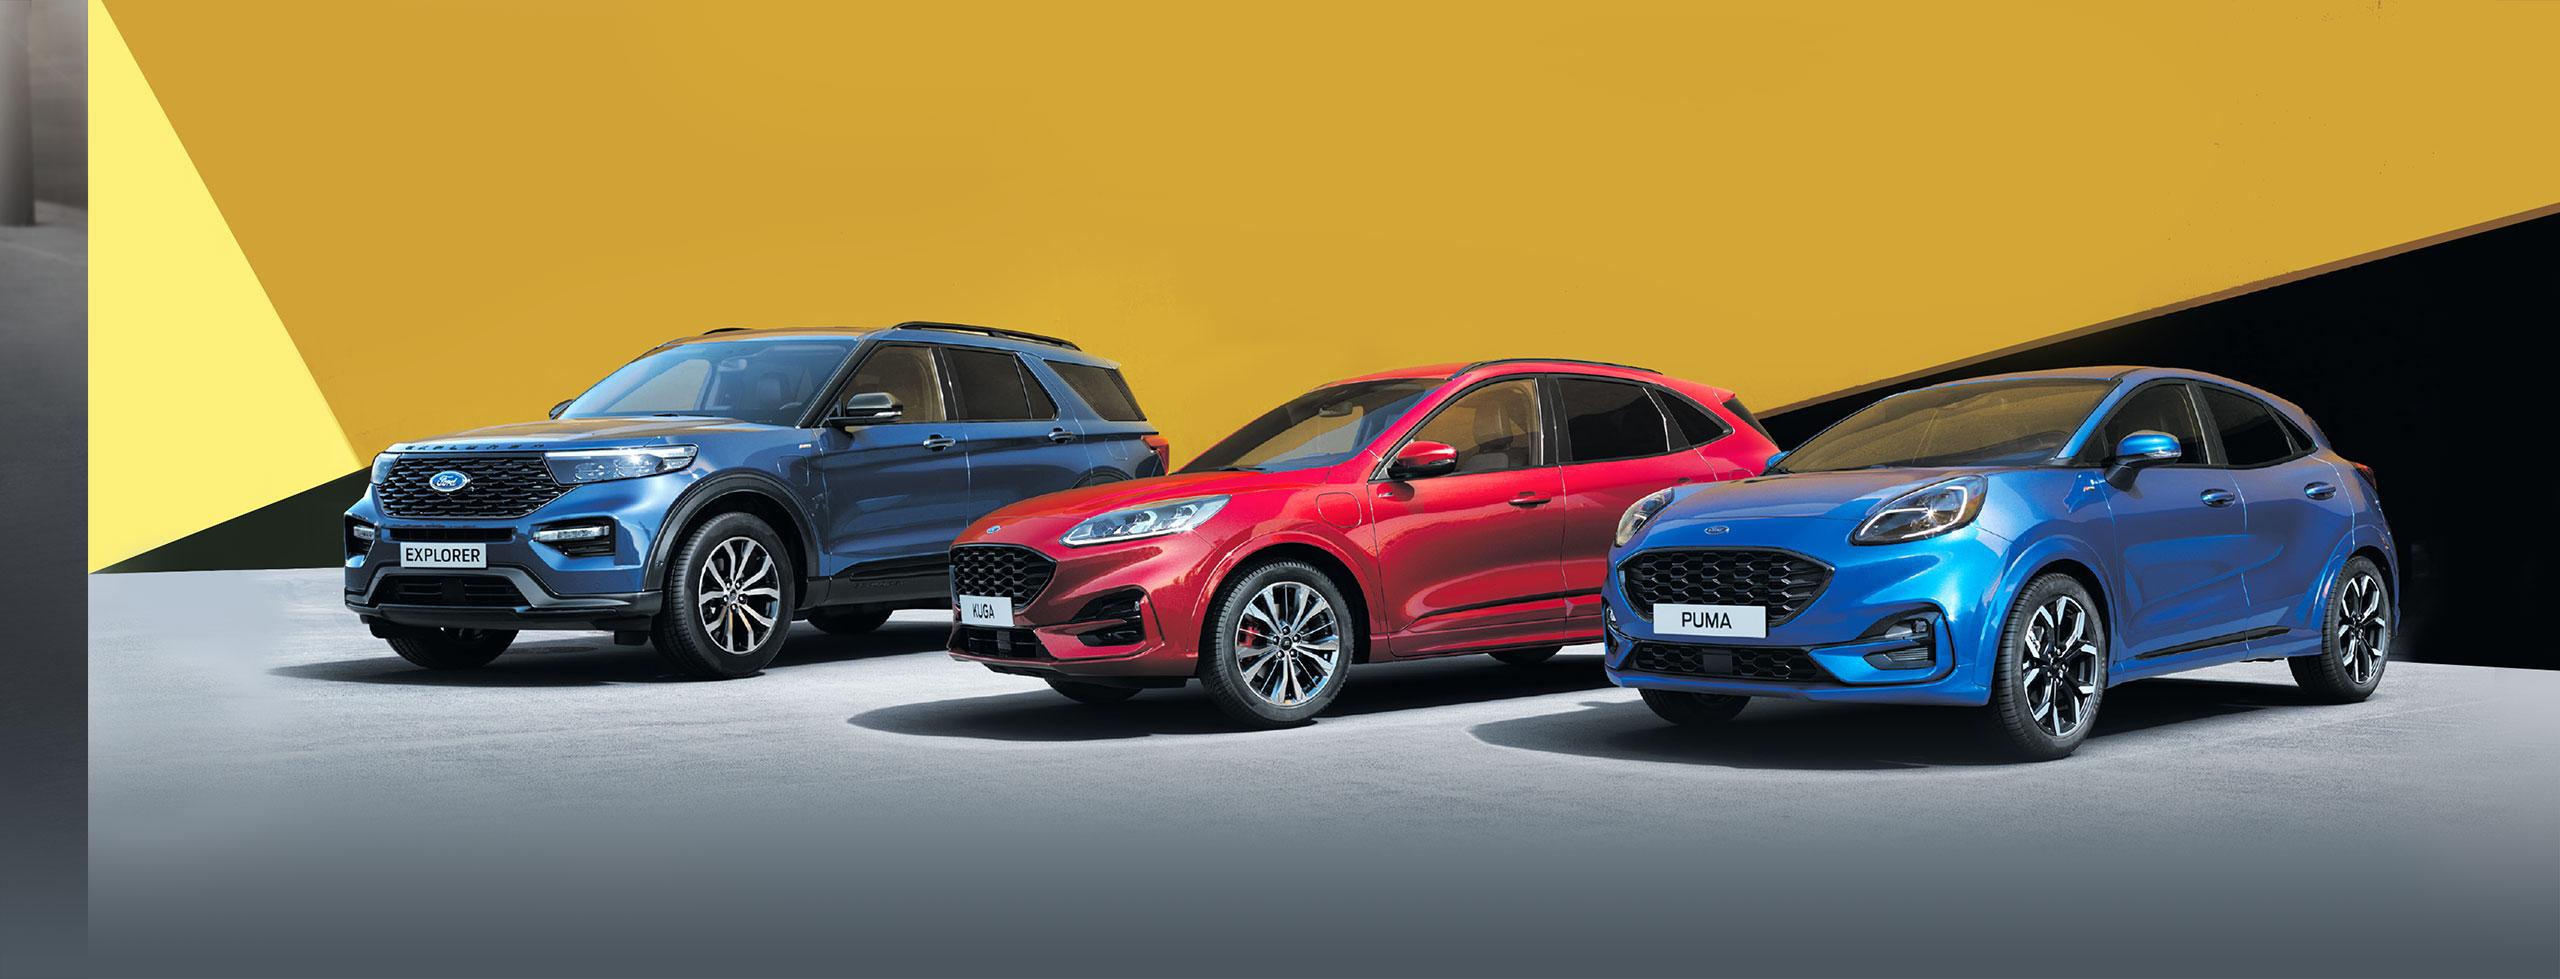 ford-kuga-ford-explorer-ford-puma-2021-levorannan-auto-levoranta-autoliike-1